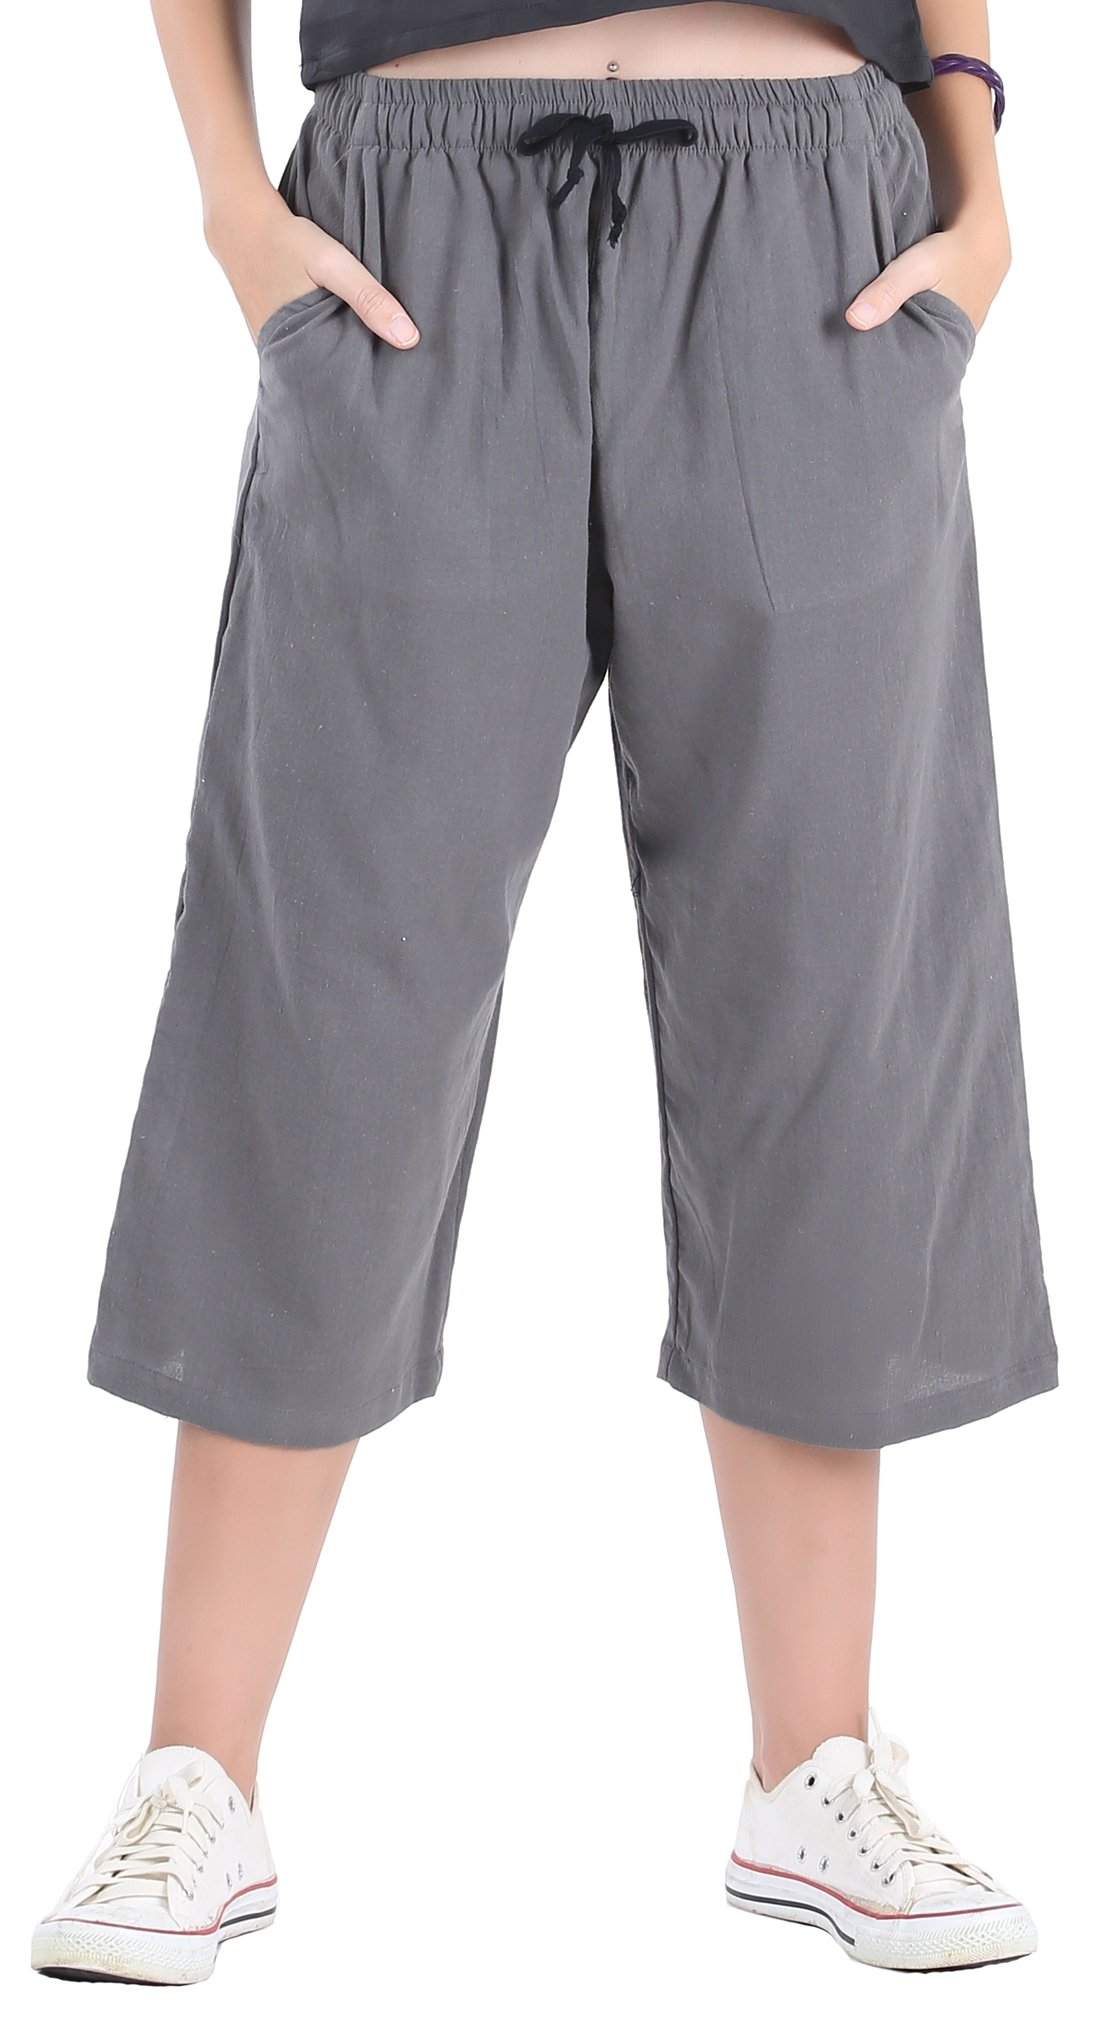 CandyHusky Womens Loose Elastic Waist Cotton Casual Capri Wide Leg Palazzo Pants (2XL/3XL, Dark Grey)